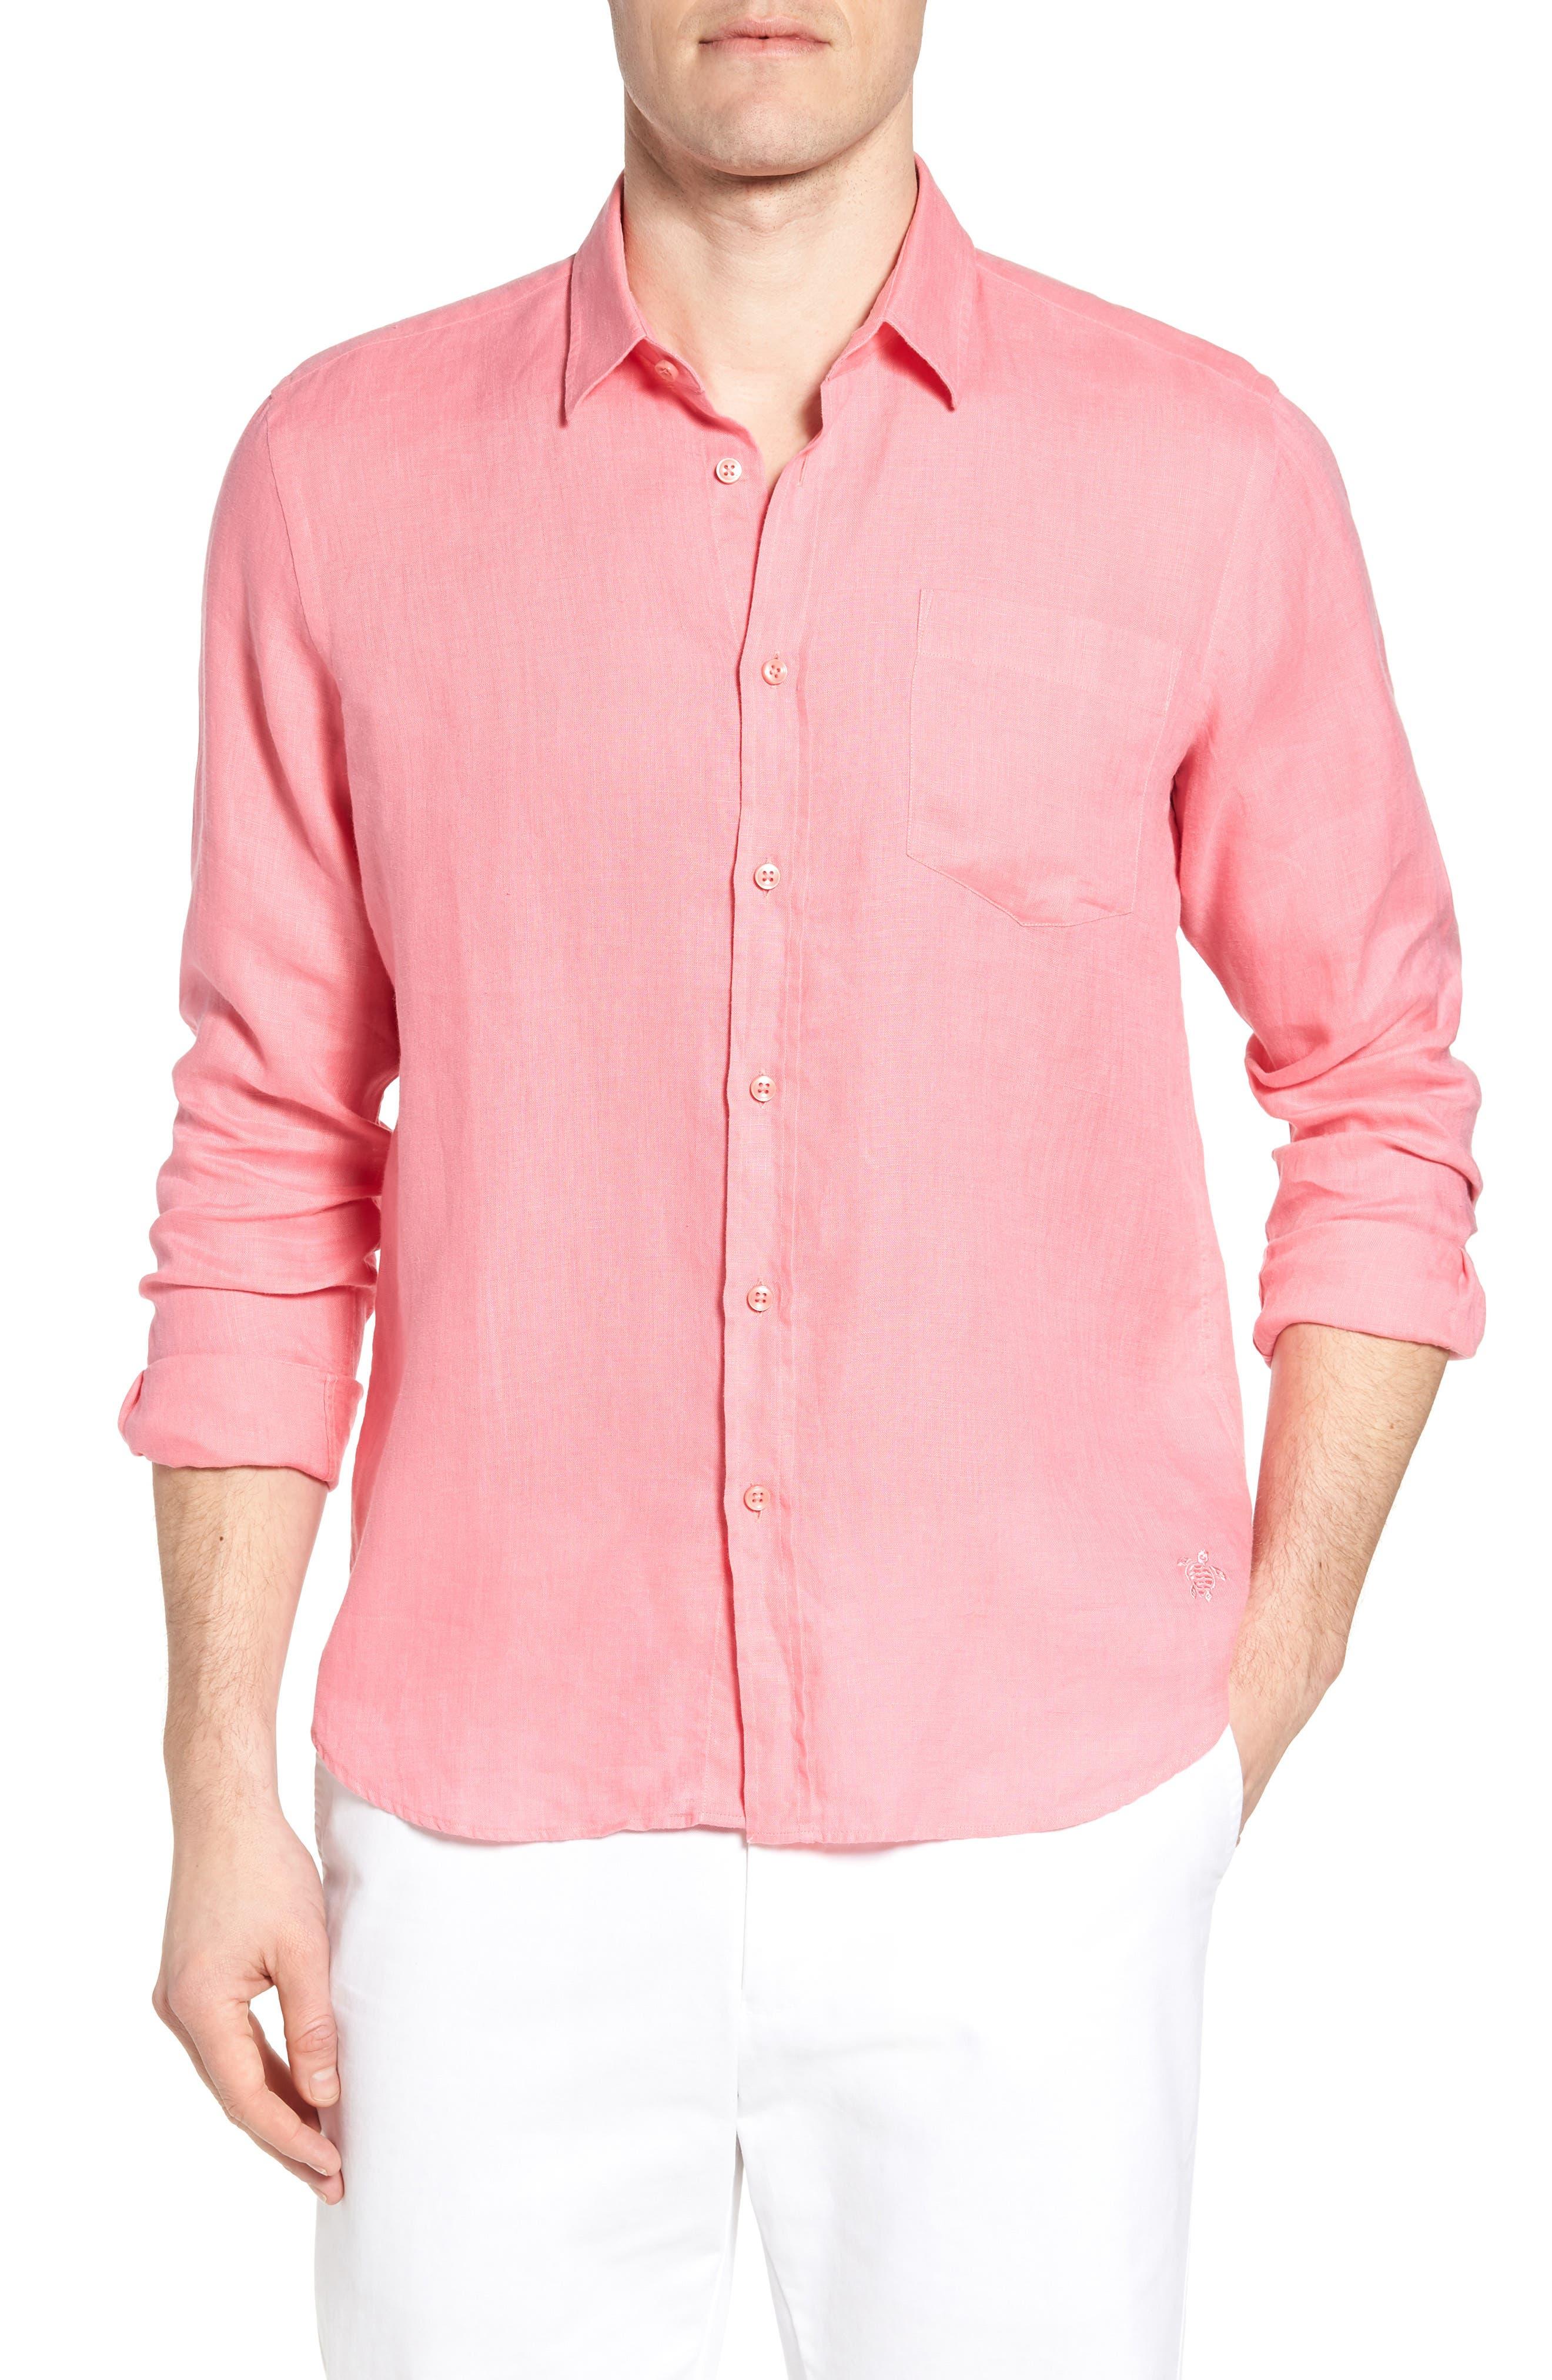 Alternate Image 1 Selected - Vilebrequin Caroubie Regular Fit Linen Sport Shirt